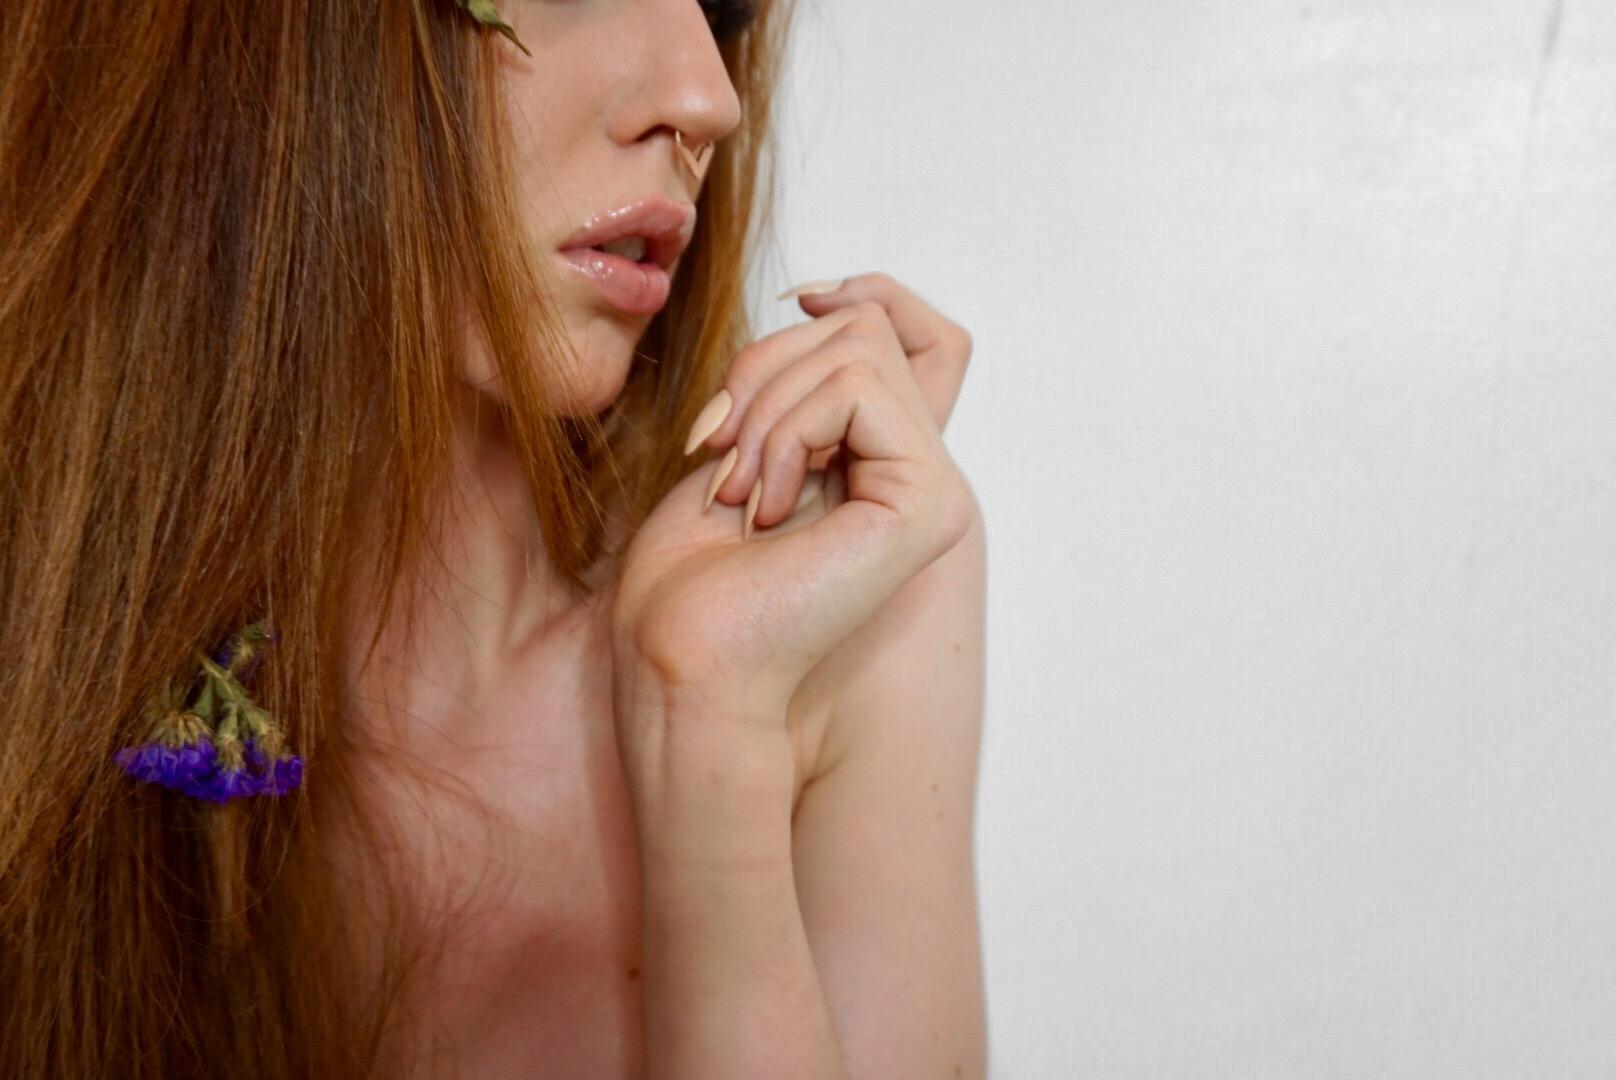 Nails by @DippyCowNails, Wearing @DuwopCosmetics Lip Venom, Nose ring by @ElishaFrancis